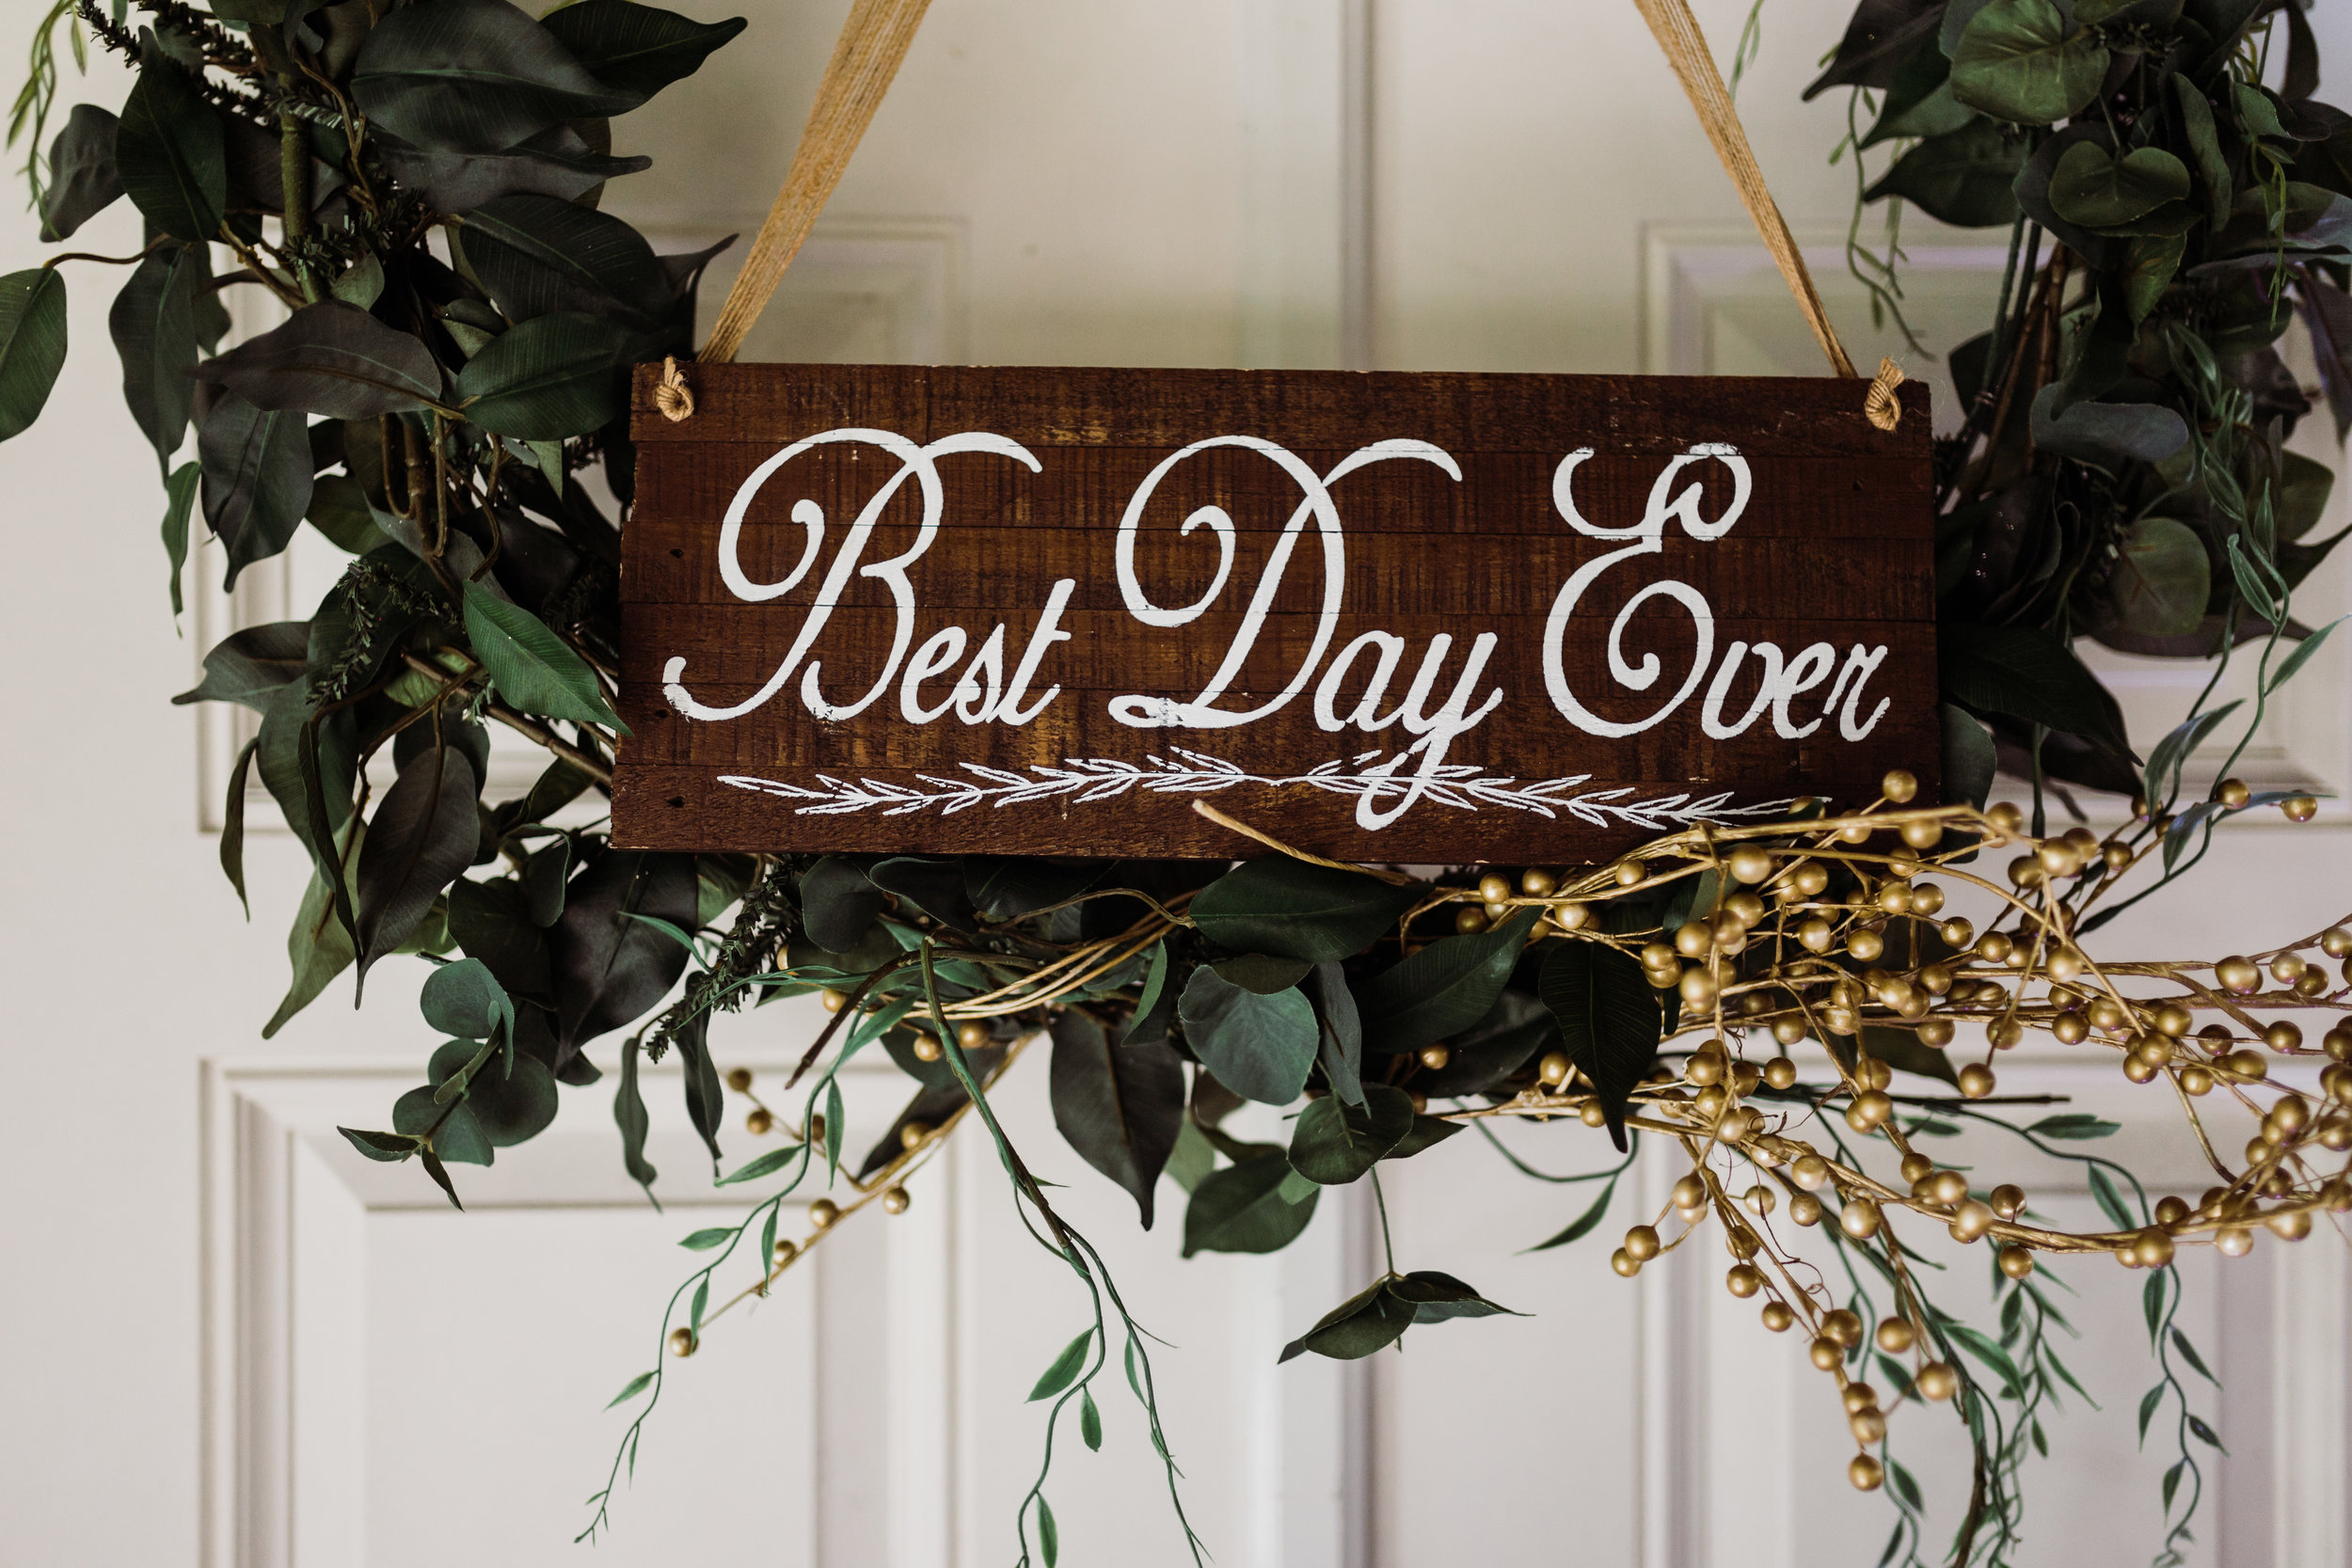 2017.10.14 Samantha and Matthew Crabtree Sarasota Wedding (390 of 708).jpg